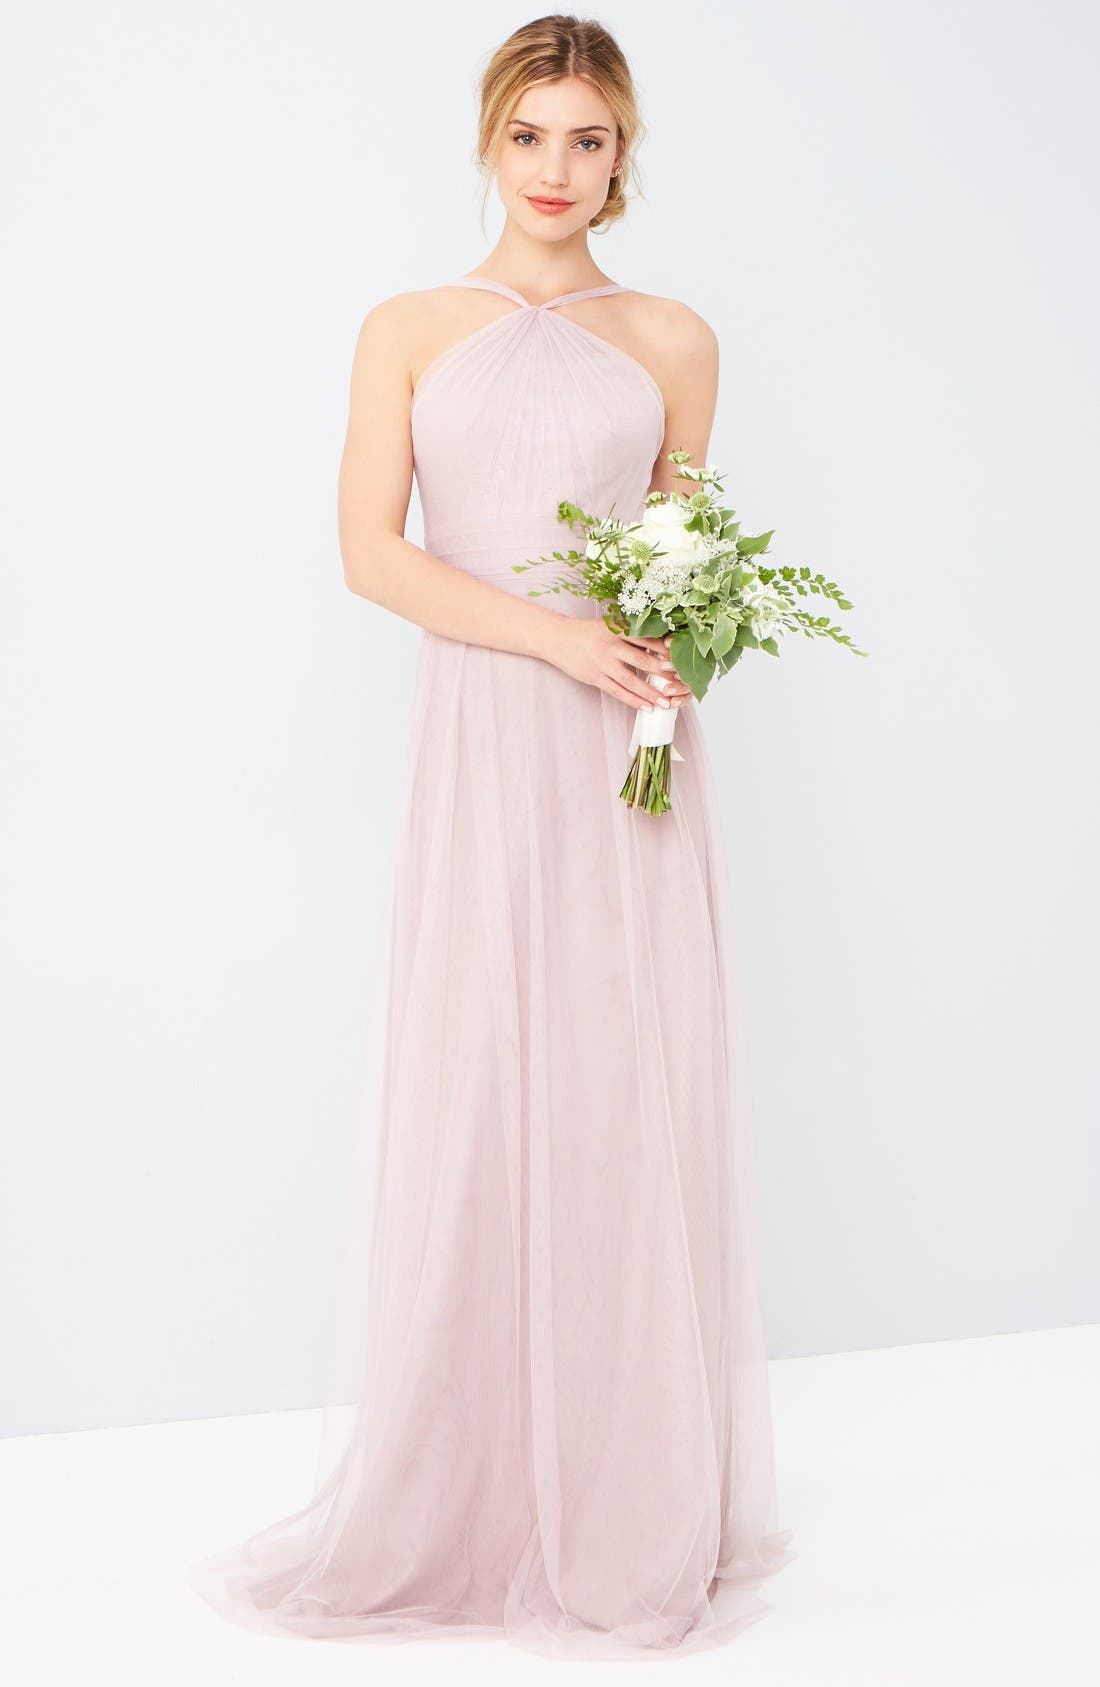 Monique lhuillier bridesmaids dresses gowns nordstrom ombrellifo Gallery